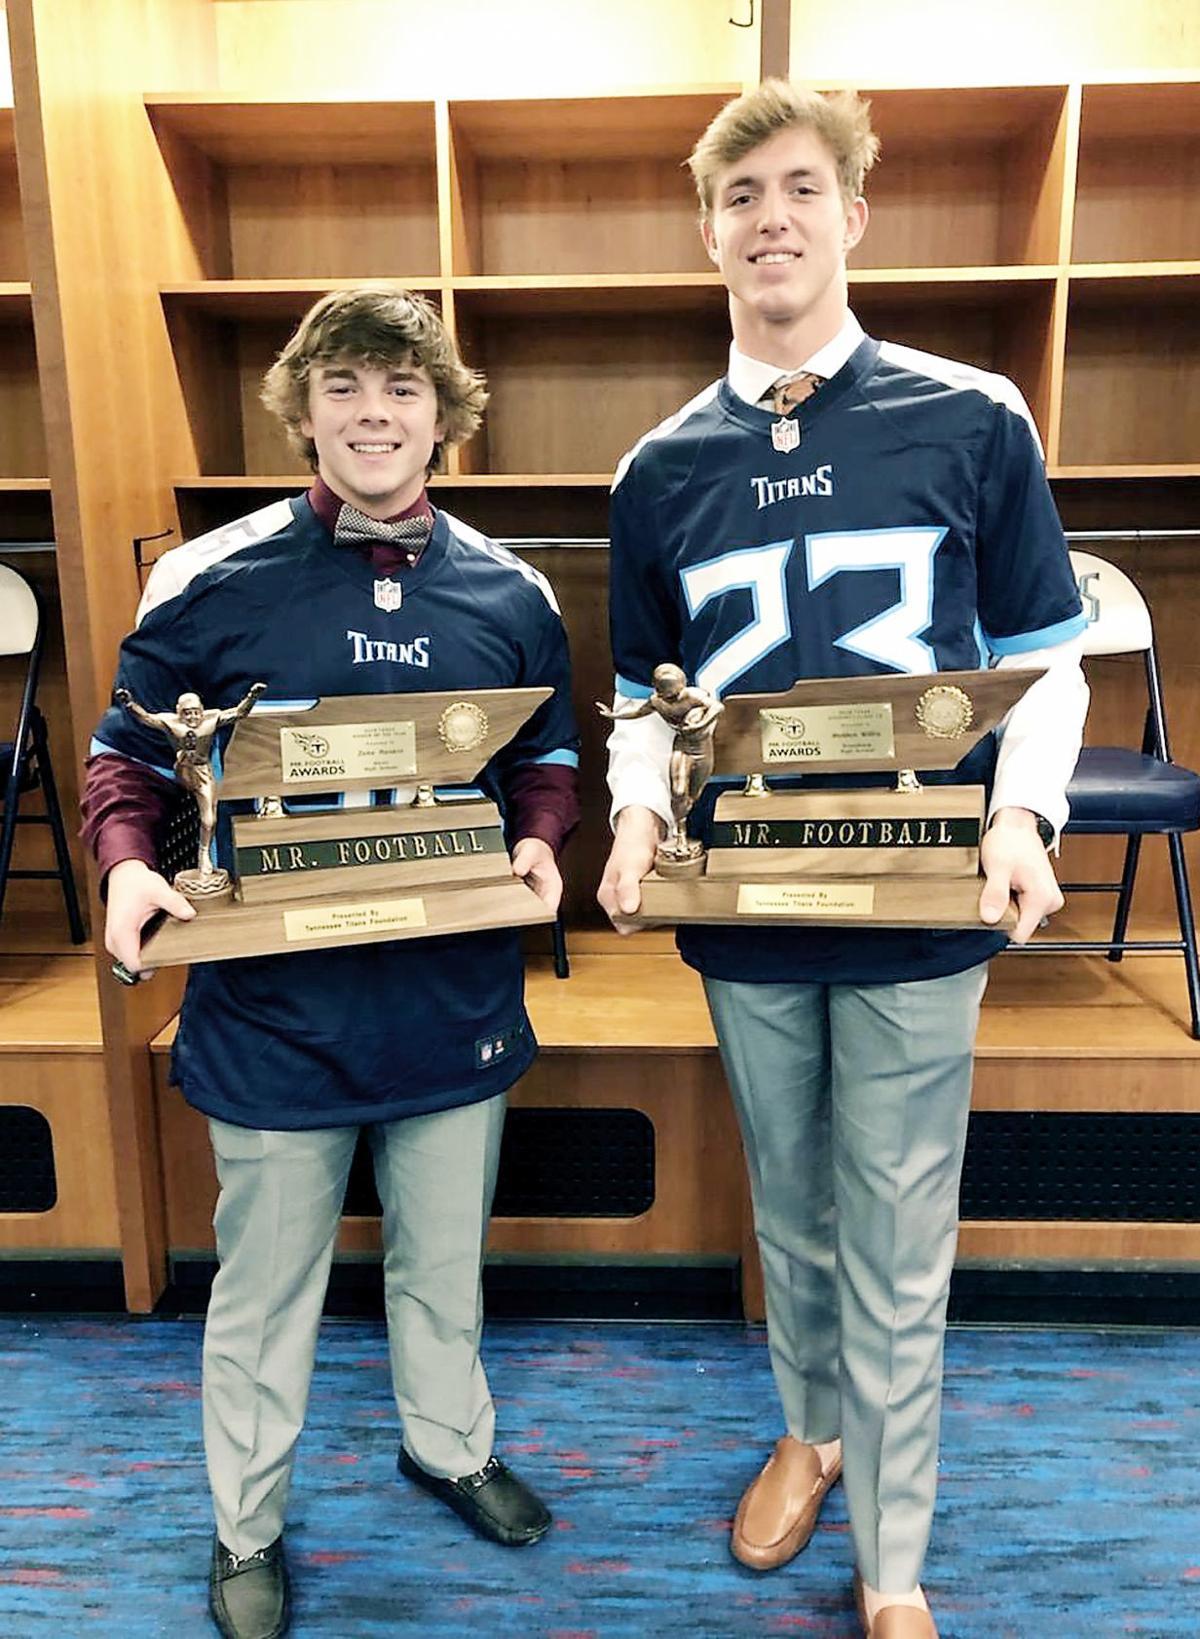 Zeke Rankin and Holden Willis Mr. Football winners